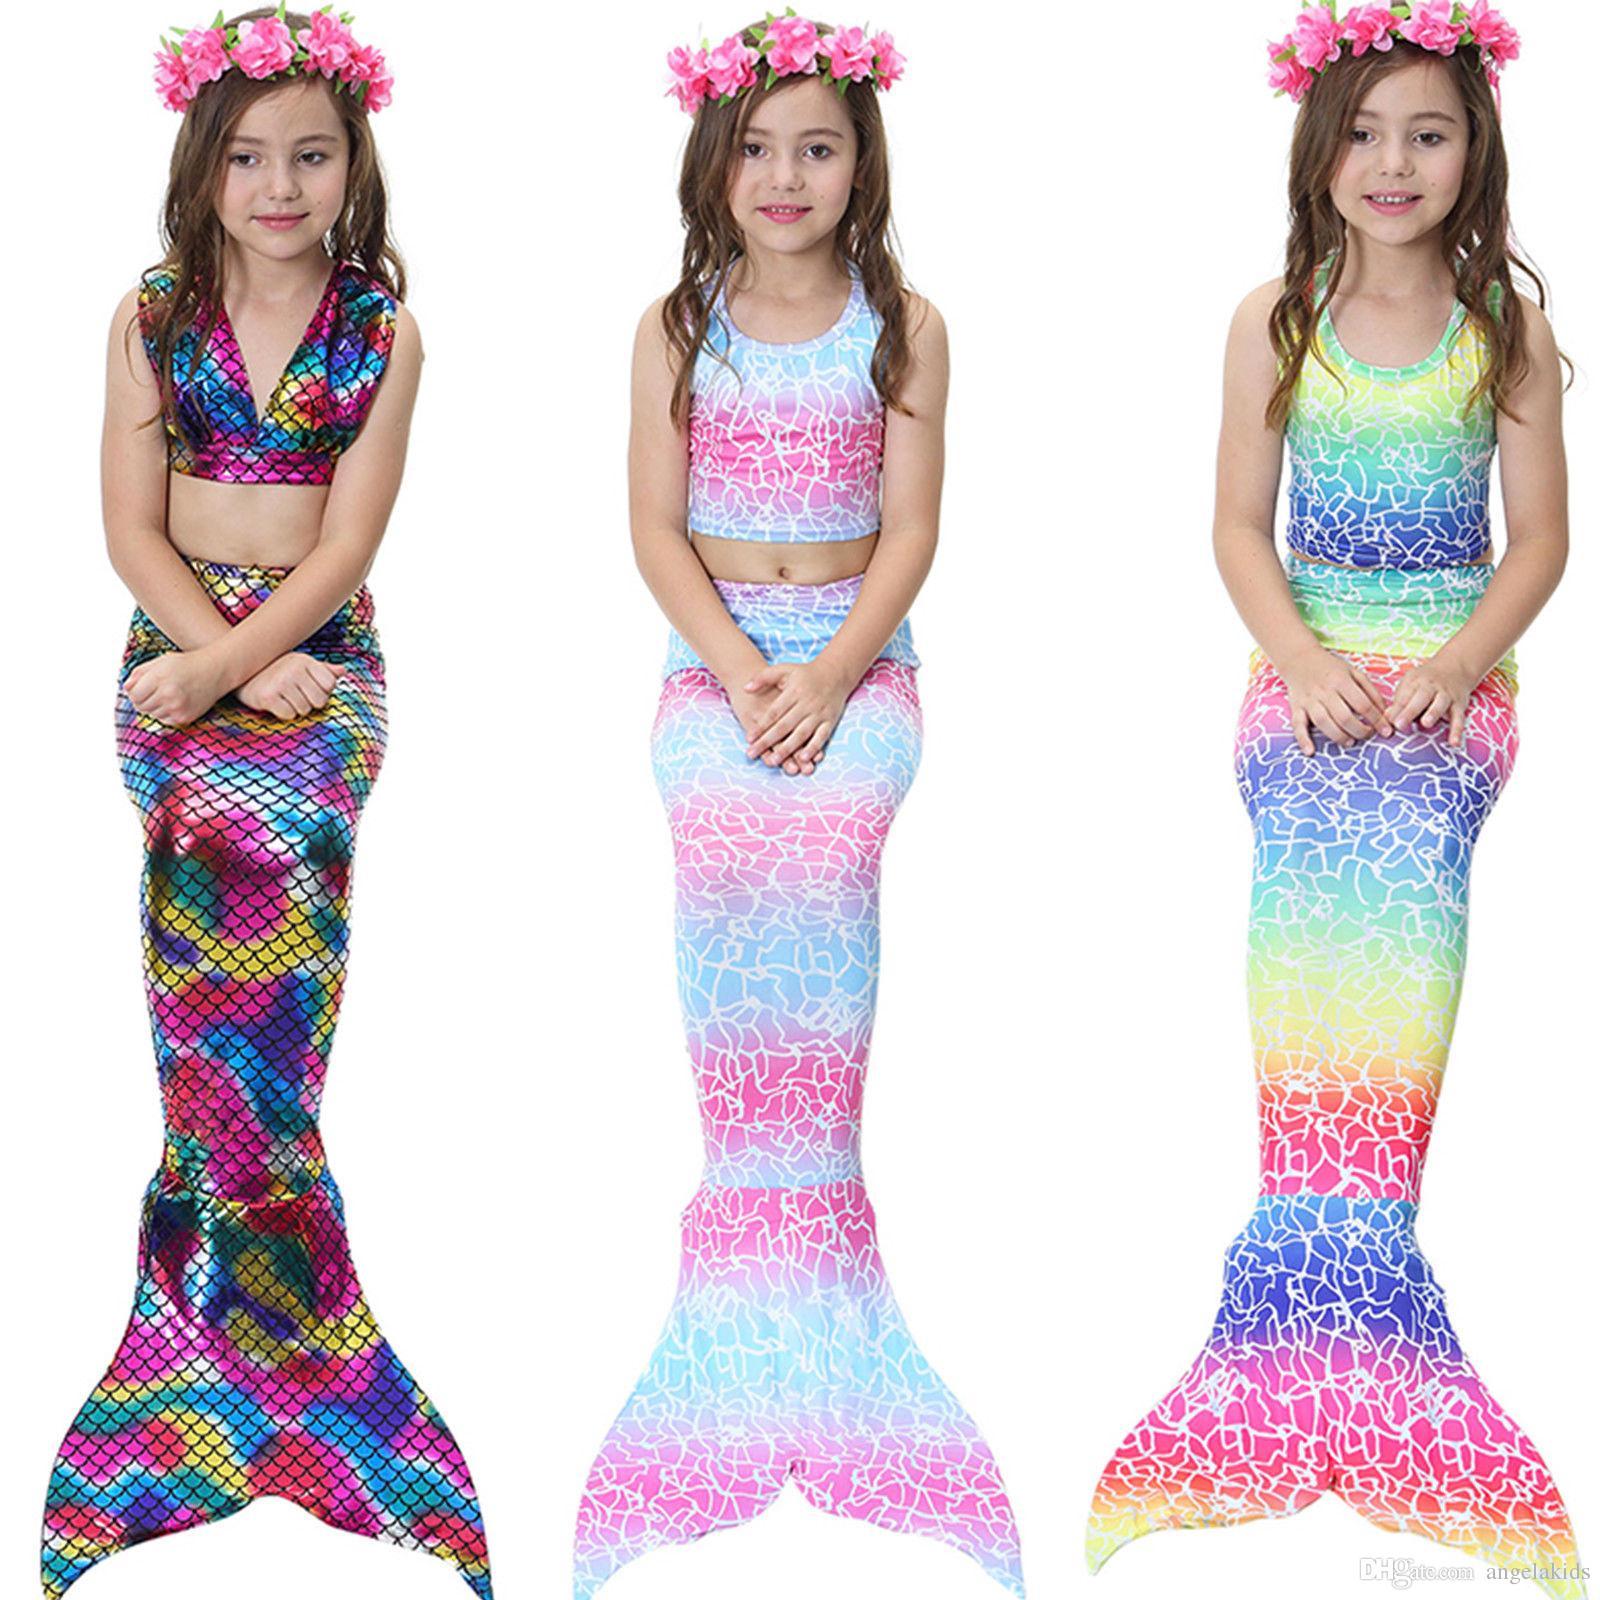 Kids Girls Mermaid Tail Swimming Bikini Set Swimwear Mono Fin Swimmable  Girls Kid 3 Pcs Swimwear Mermaid Tail Online with  14.97 Piece on  Angelakids s Store ... 11c62d3ef8f